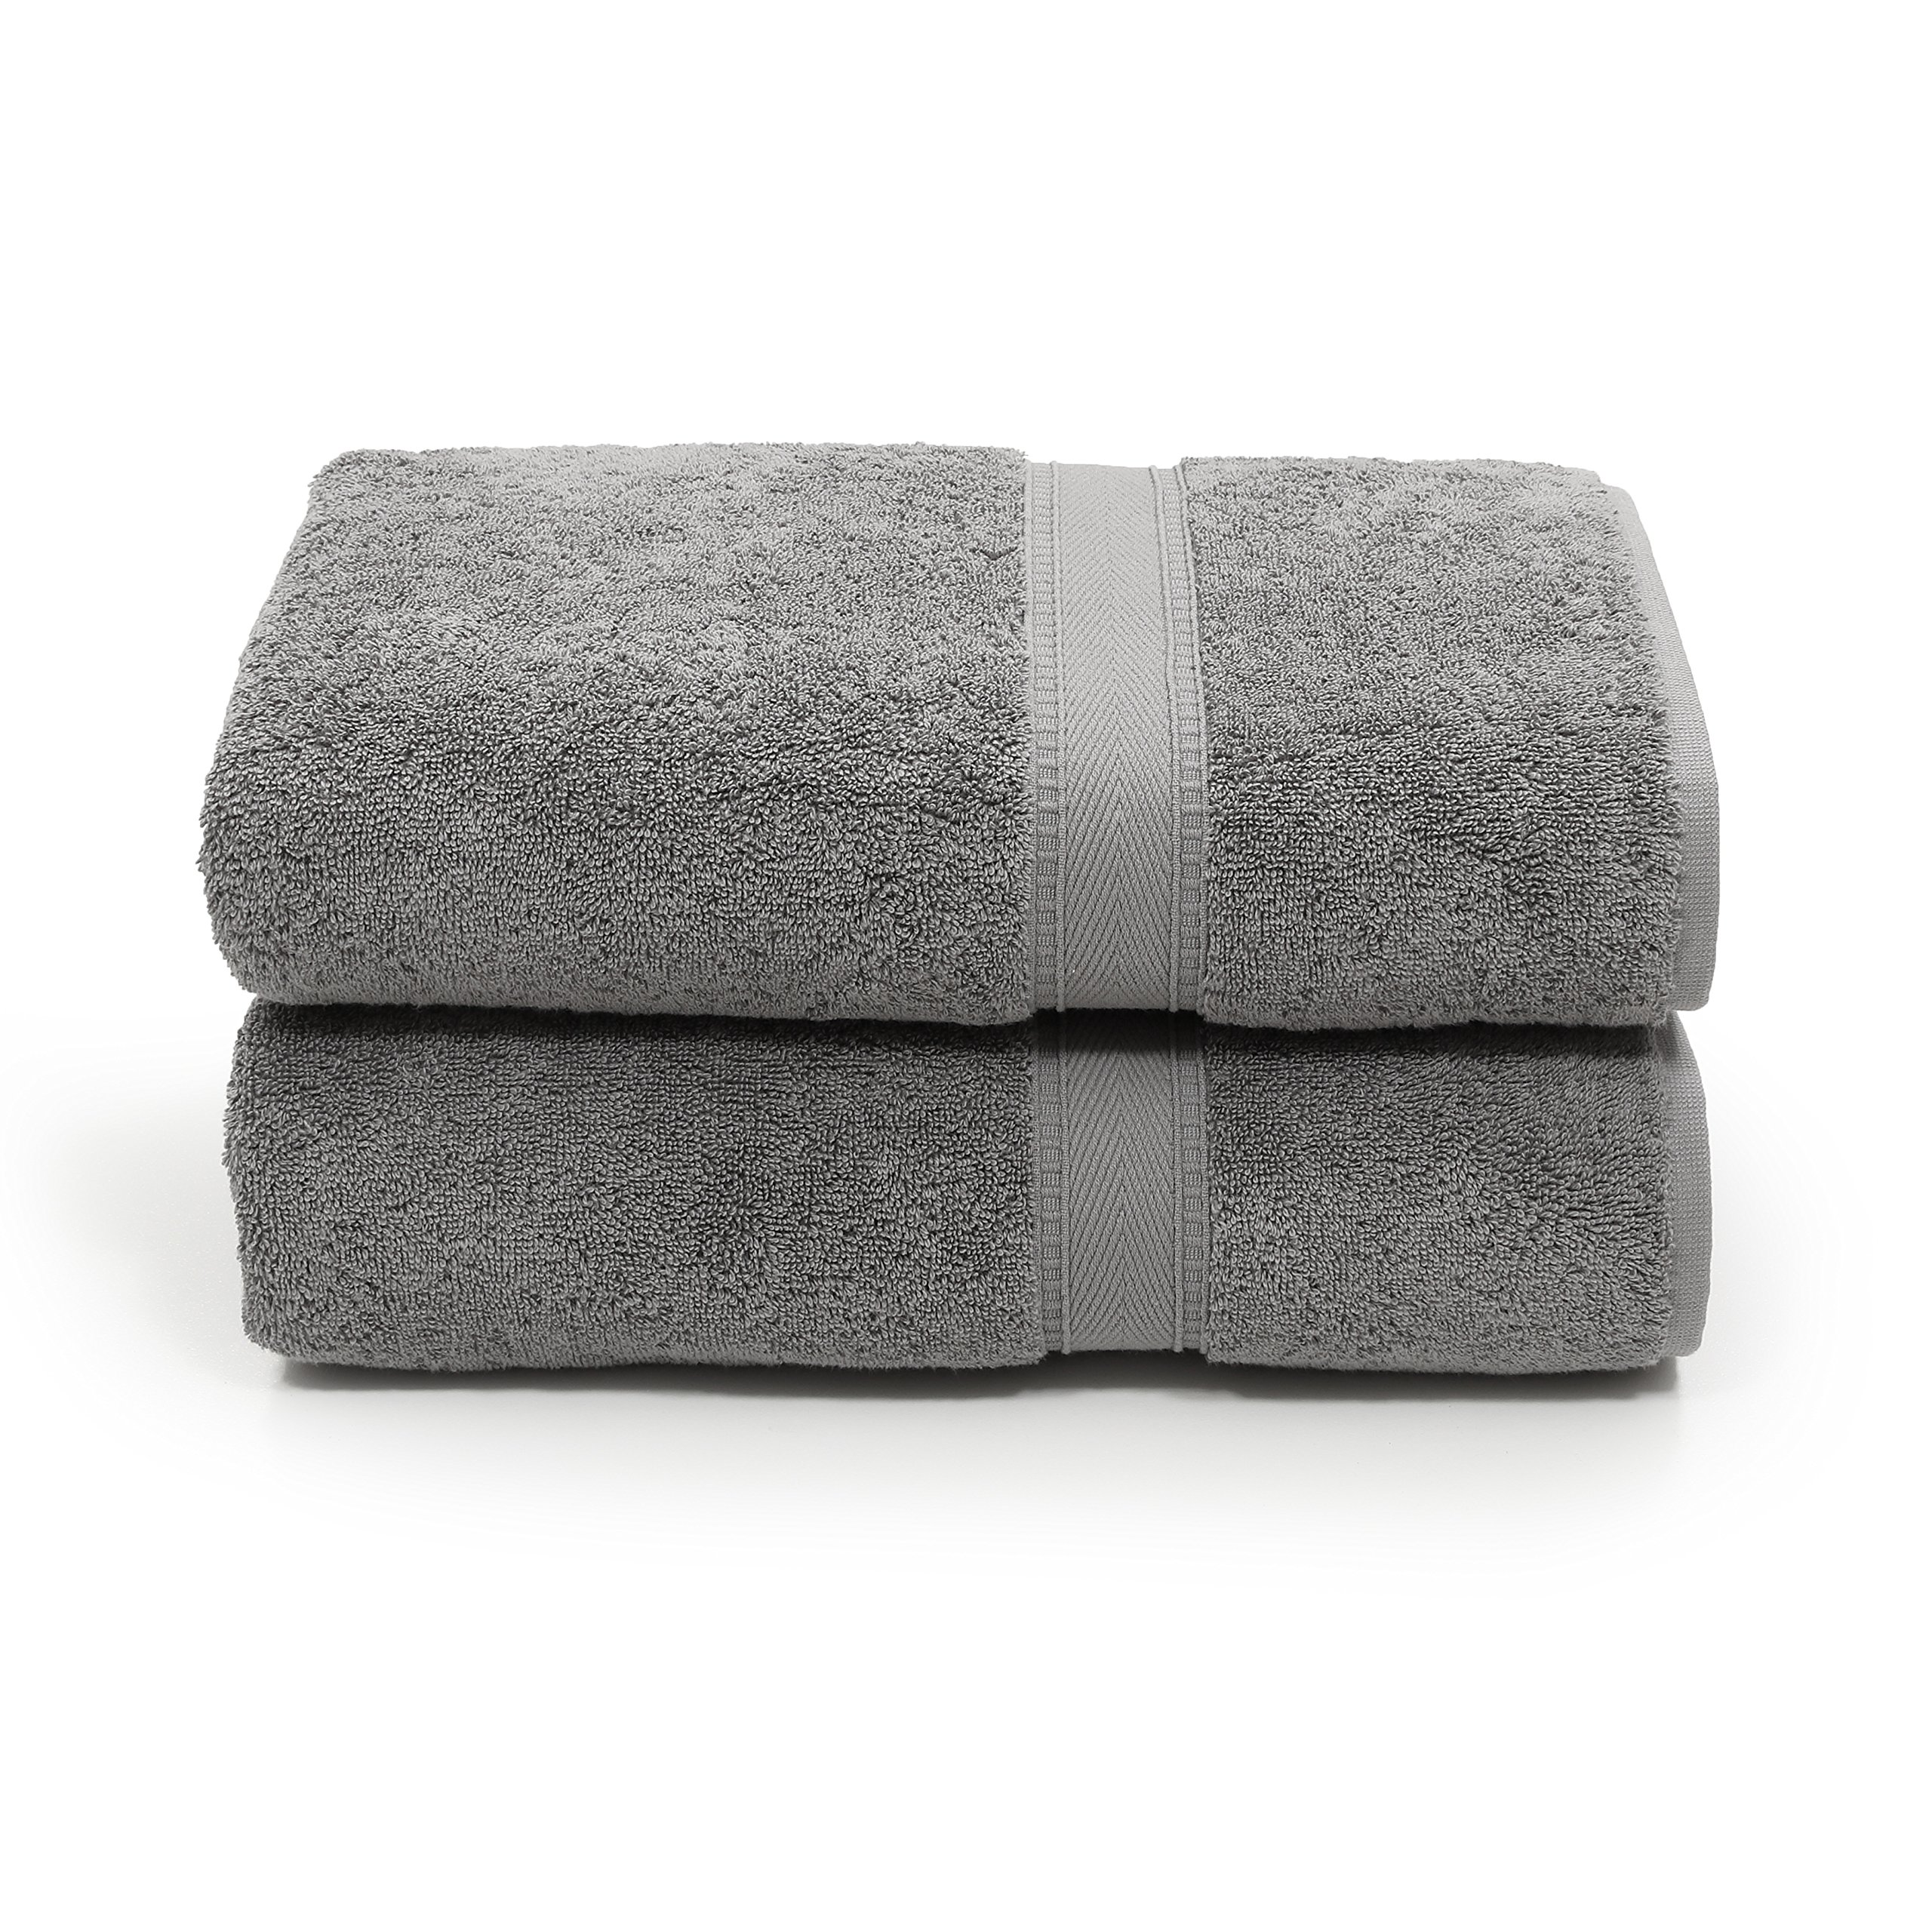 Linum Home Textiles SN96-2BT Bath Towel, Dark Grey